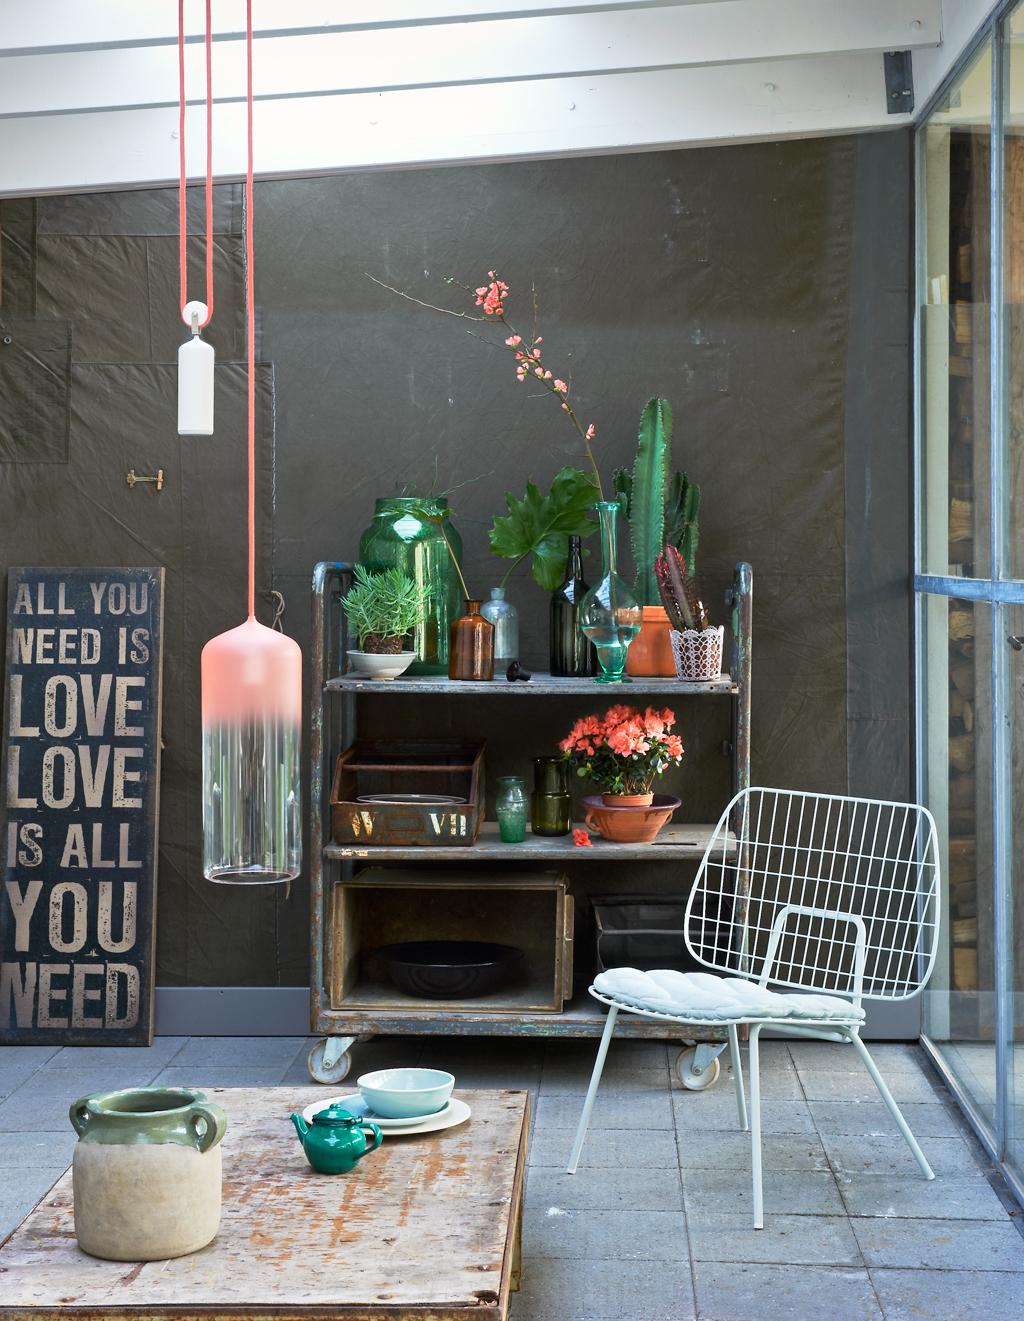 planten in glaswerk en aardewerk